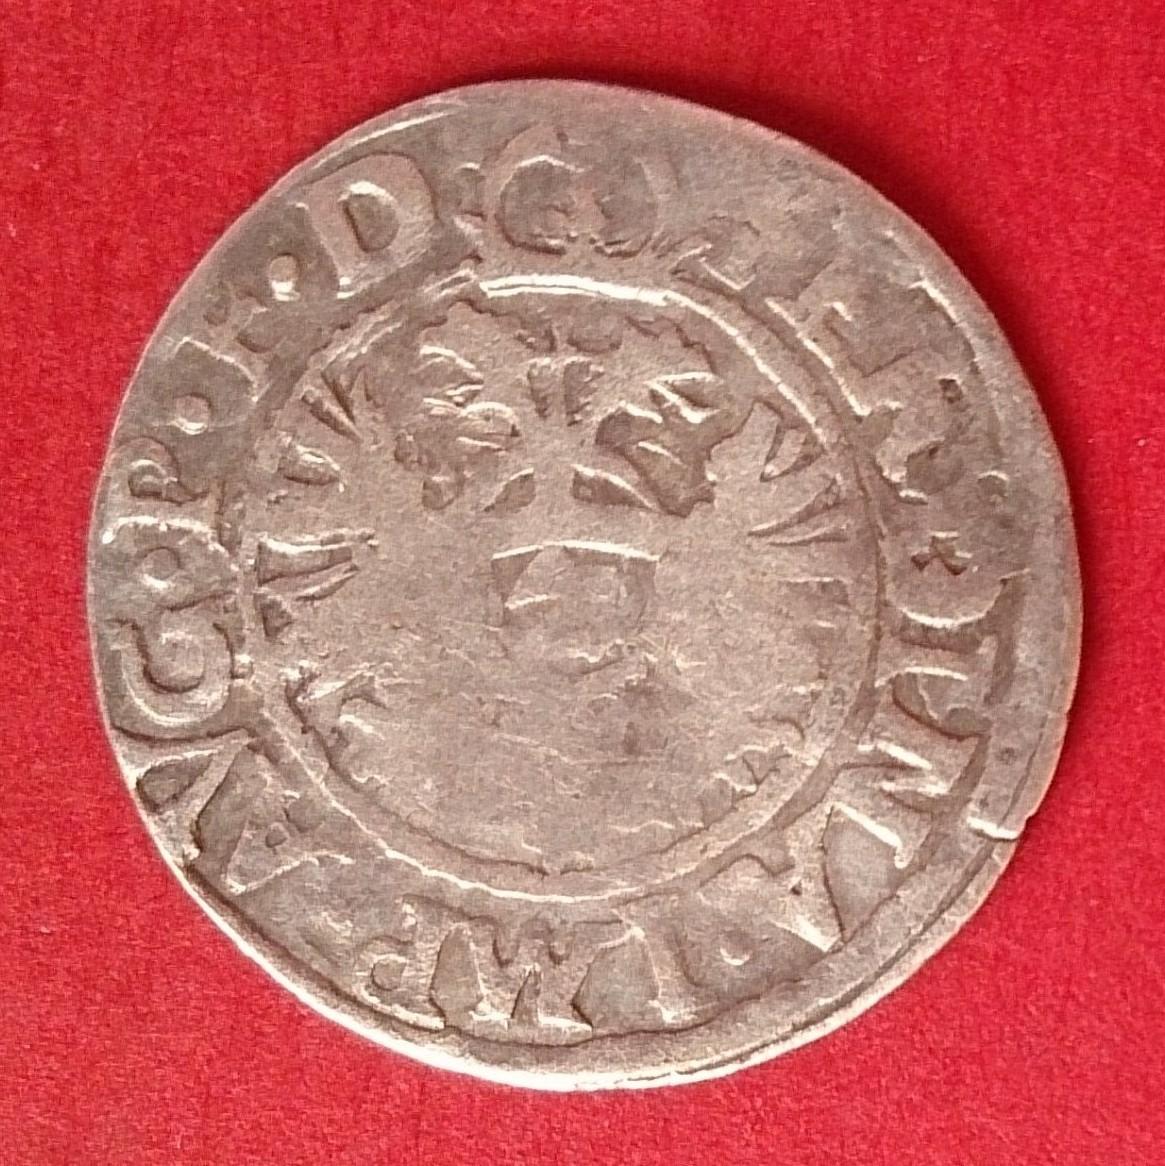 Monedas de Fernando I de Habsburgo, Infante de España - Página 2 9uc1kw